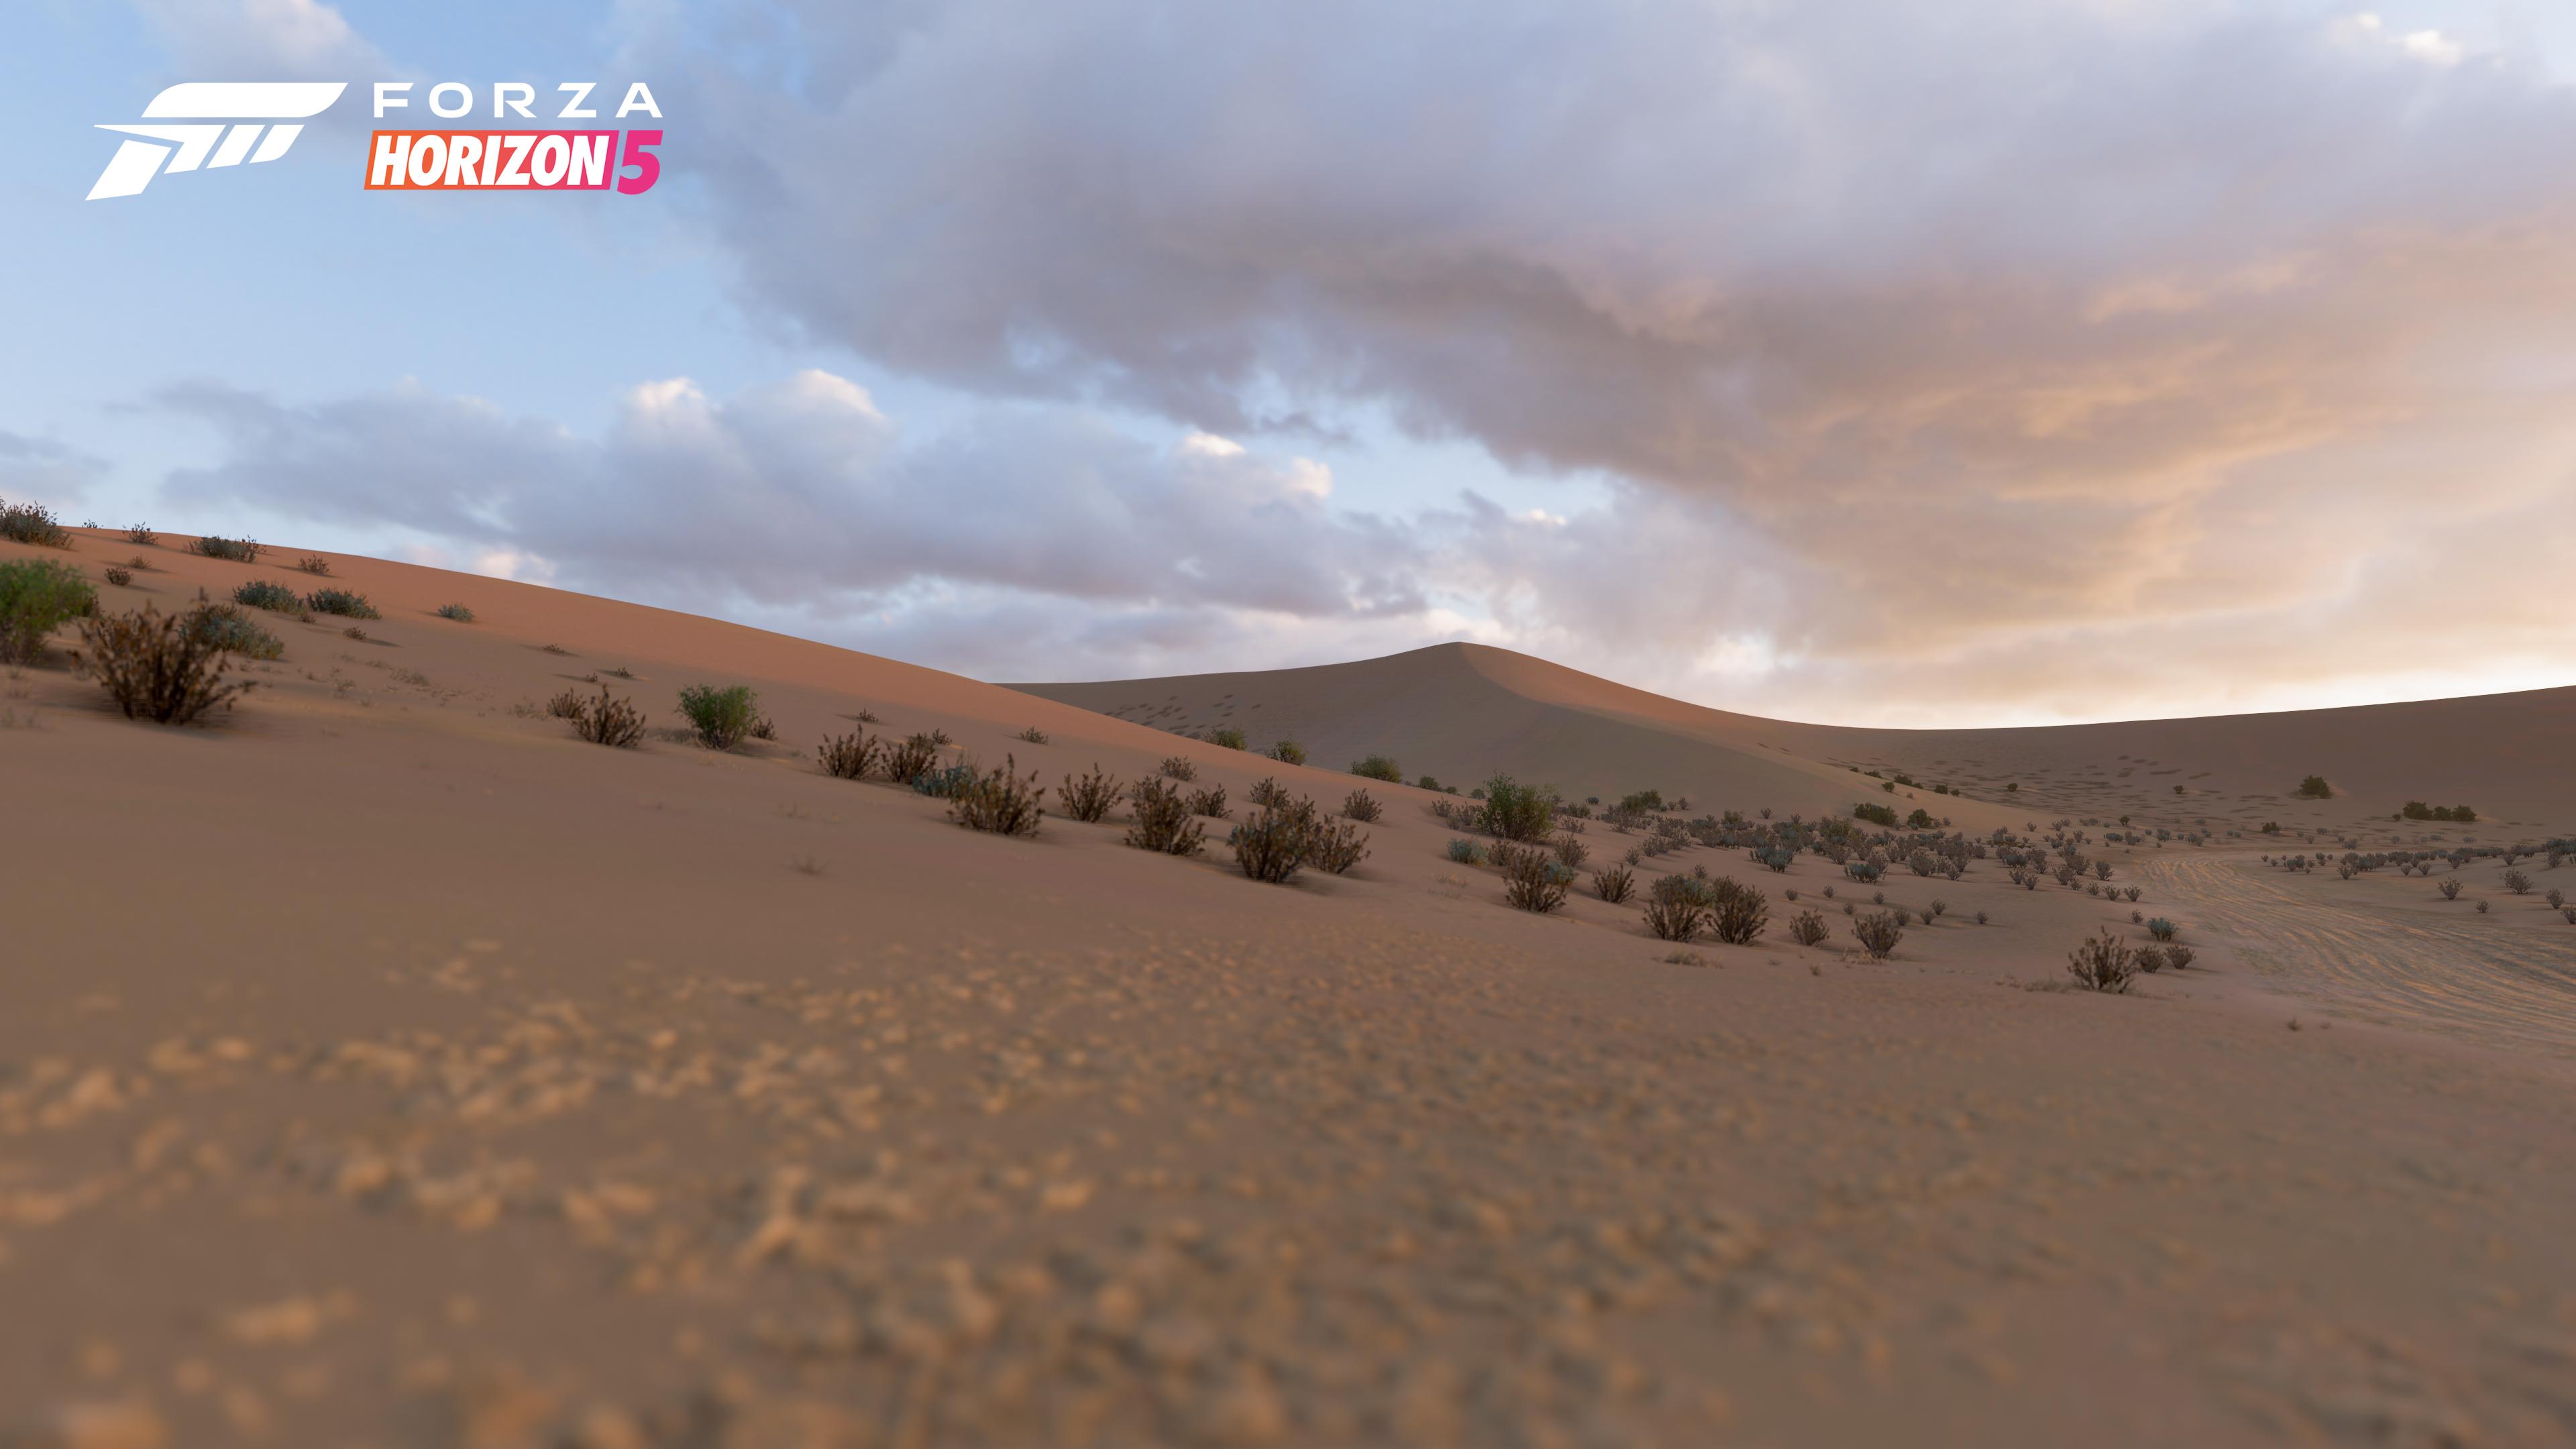 Forza Horizon 5 sand desert